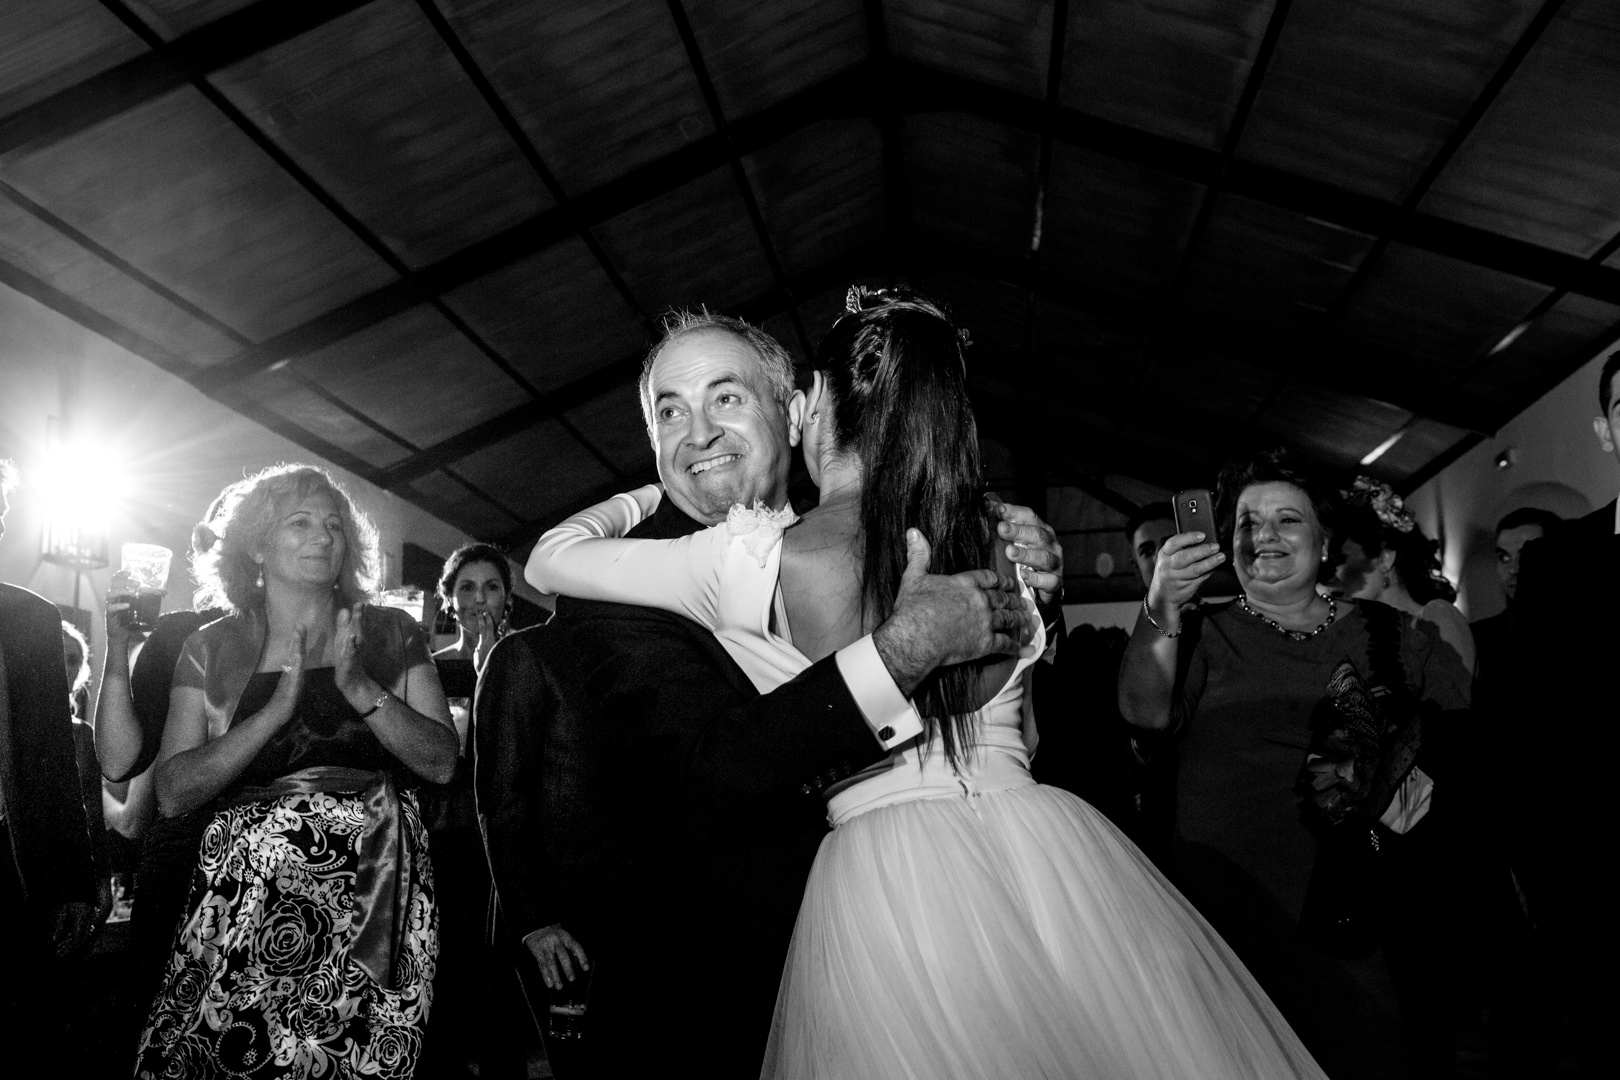 Boda-sevilla-Wedding-engagement-Rafael-Torres-fotografo-bodas-sevilla-madrid-barcelona-wedding-photographer--73.jpg